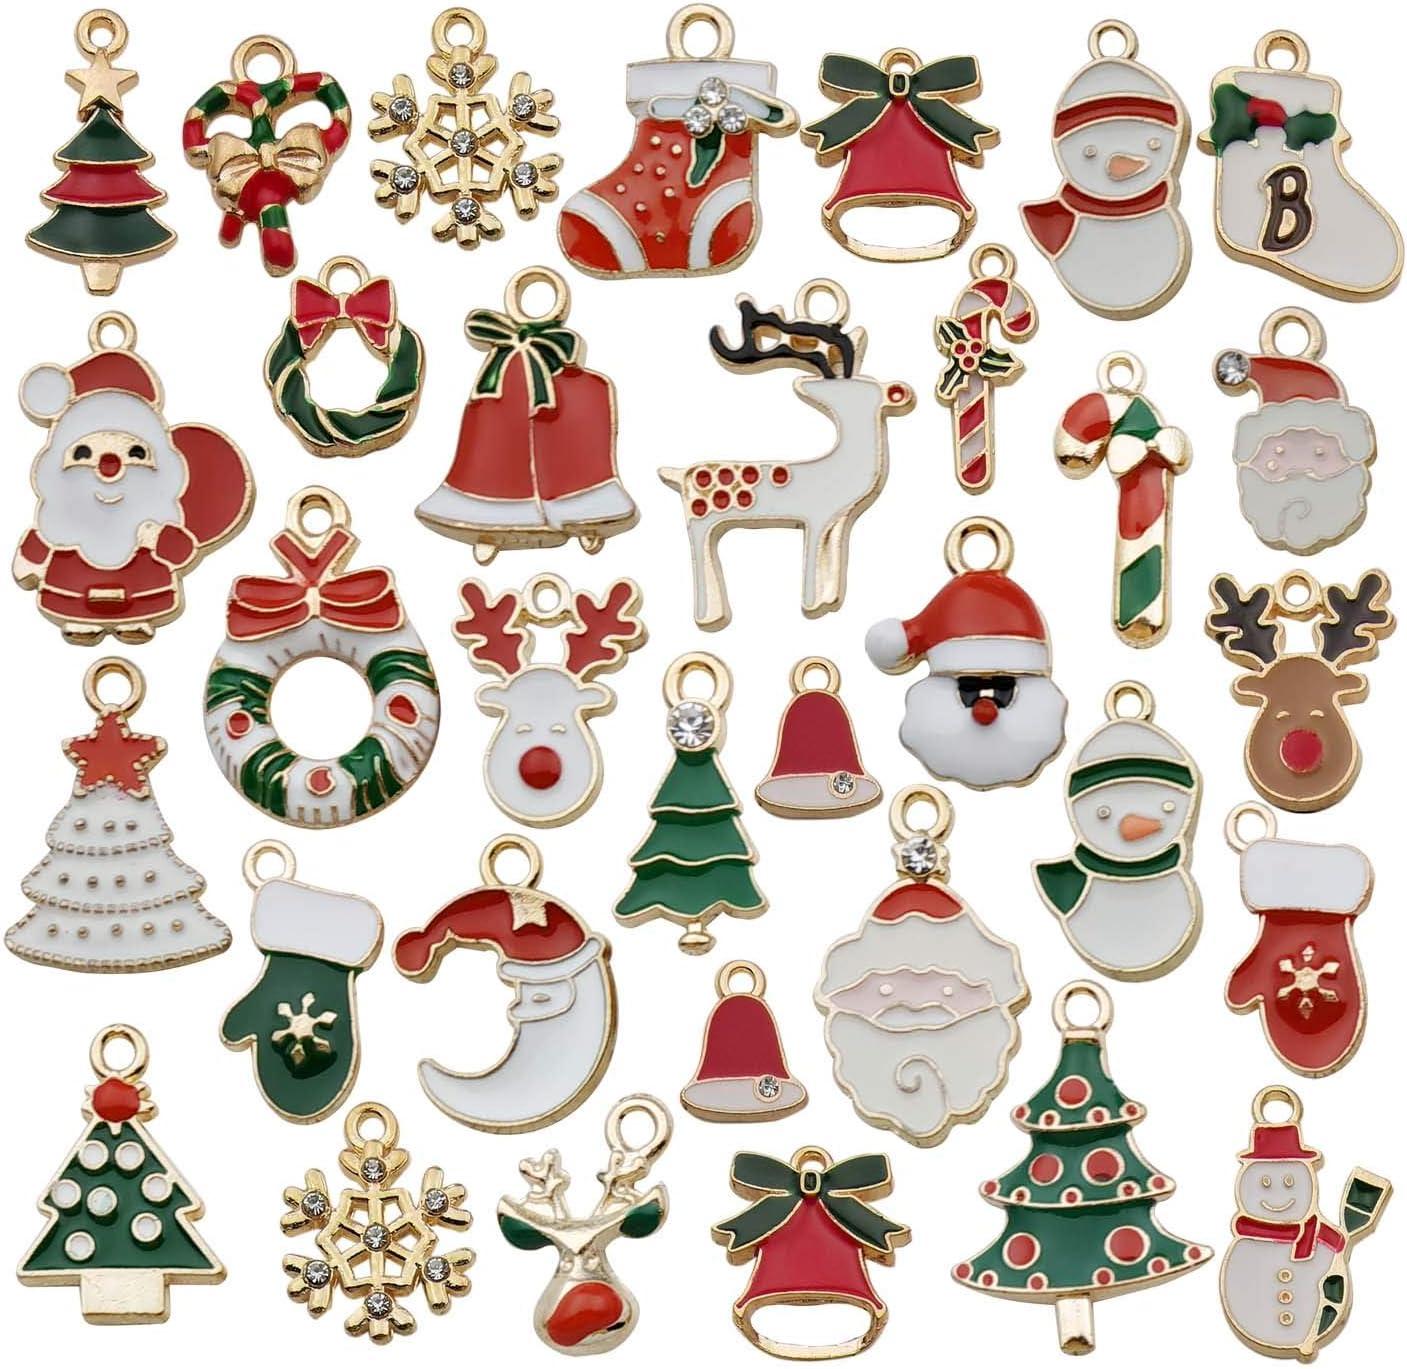 Christmas Decor Pendant Alloy Charms Mixed Enamel Ornament Party Metal 20pcs